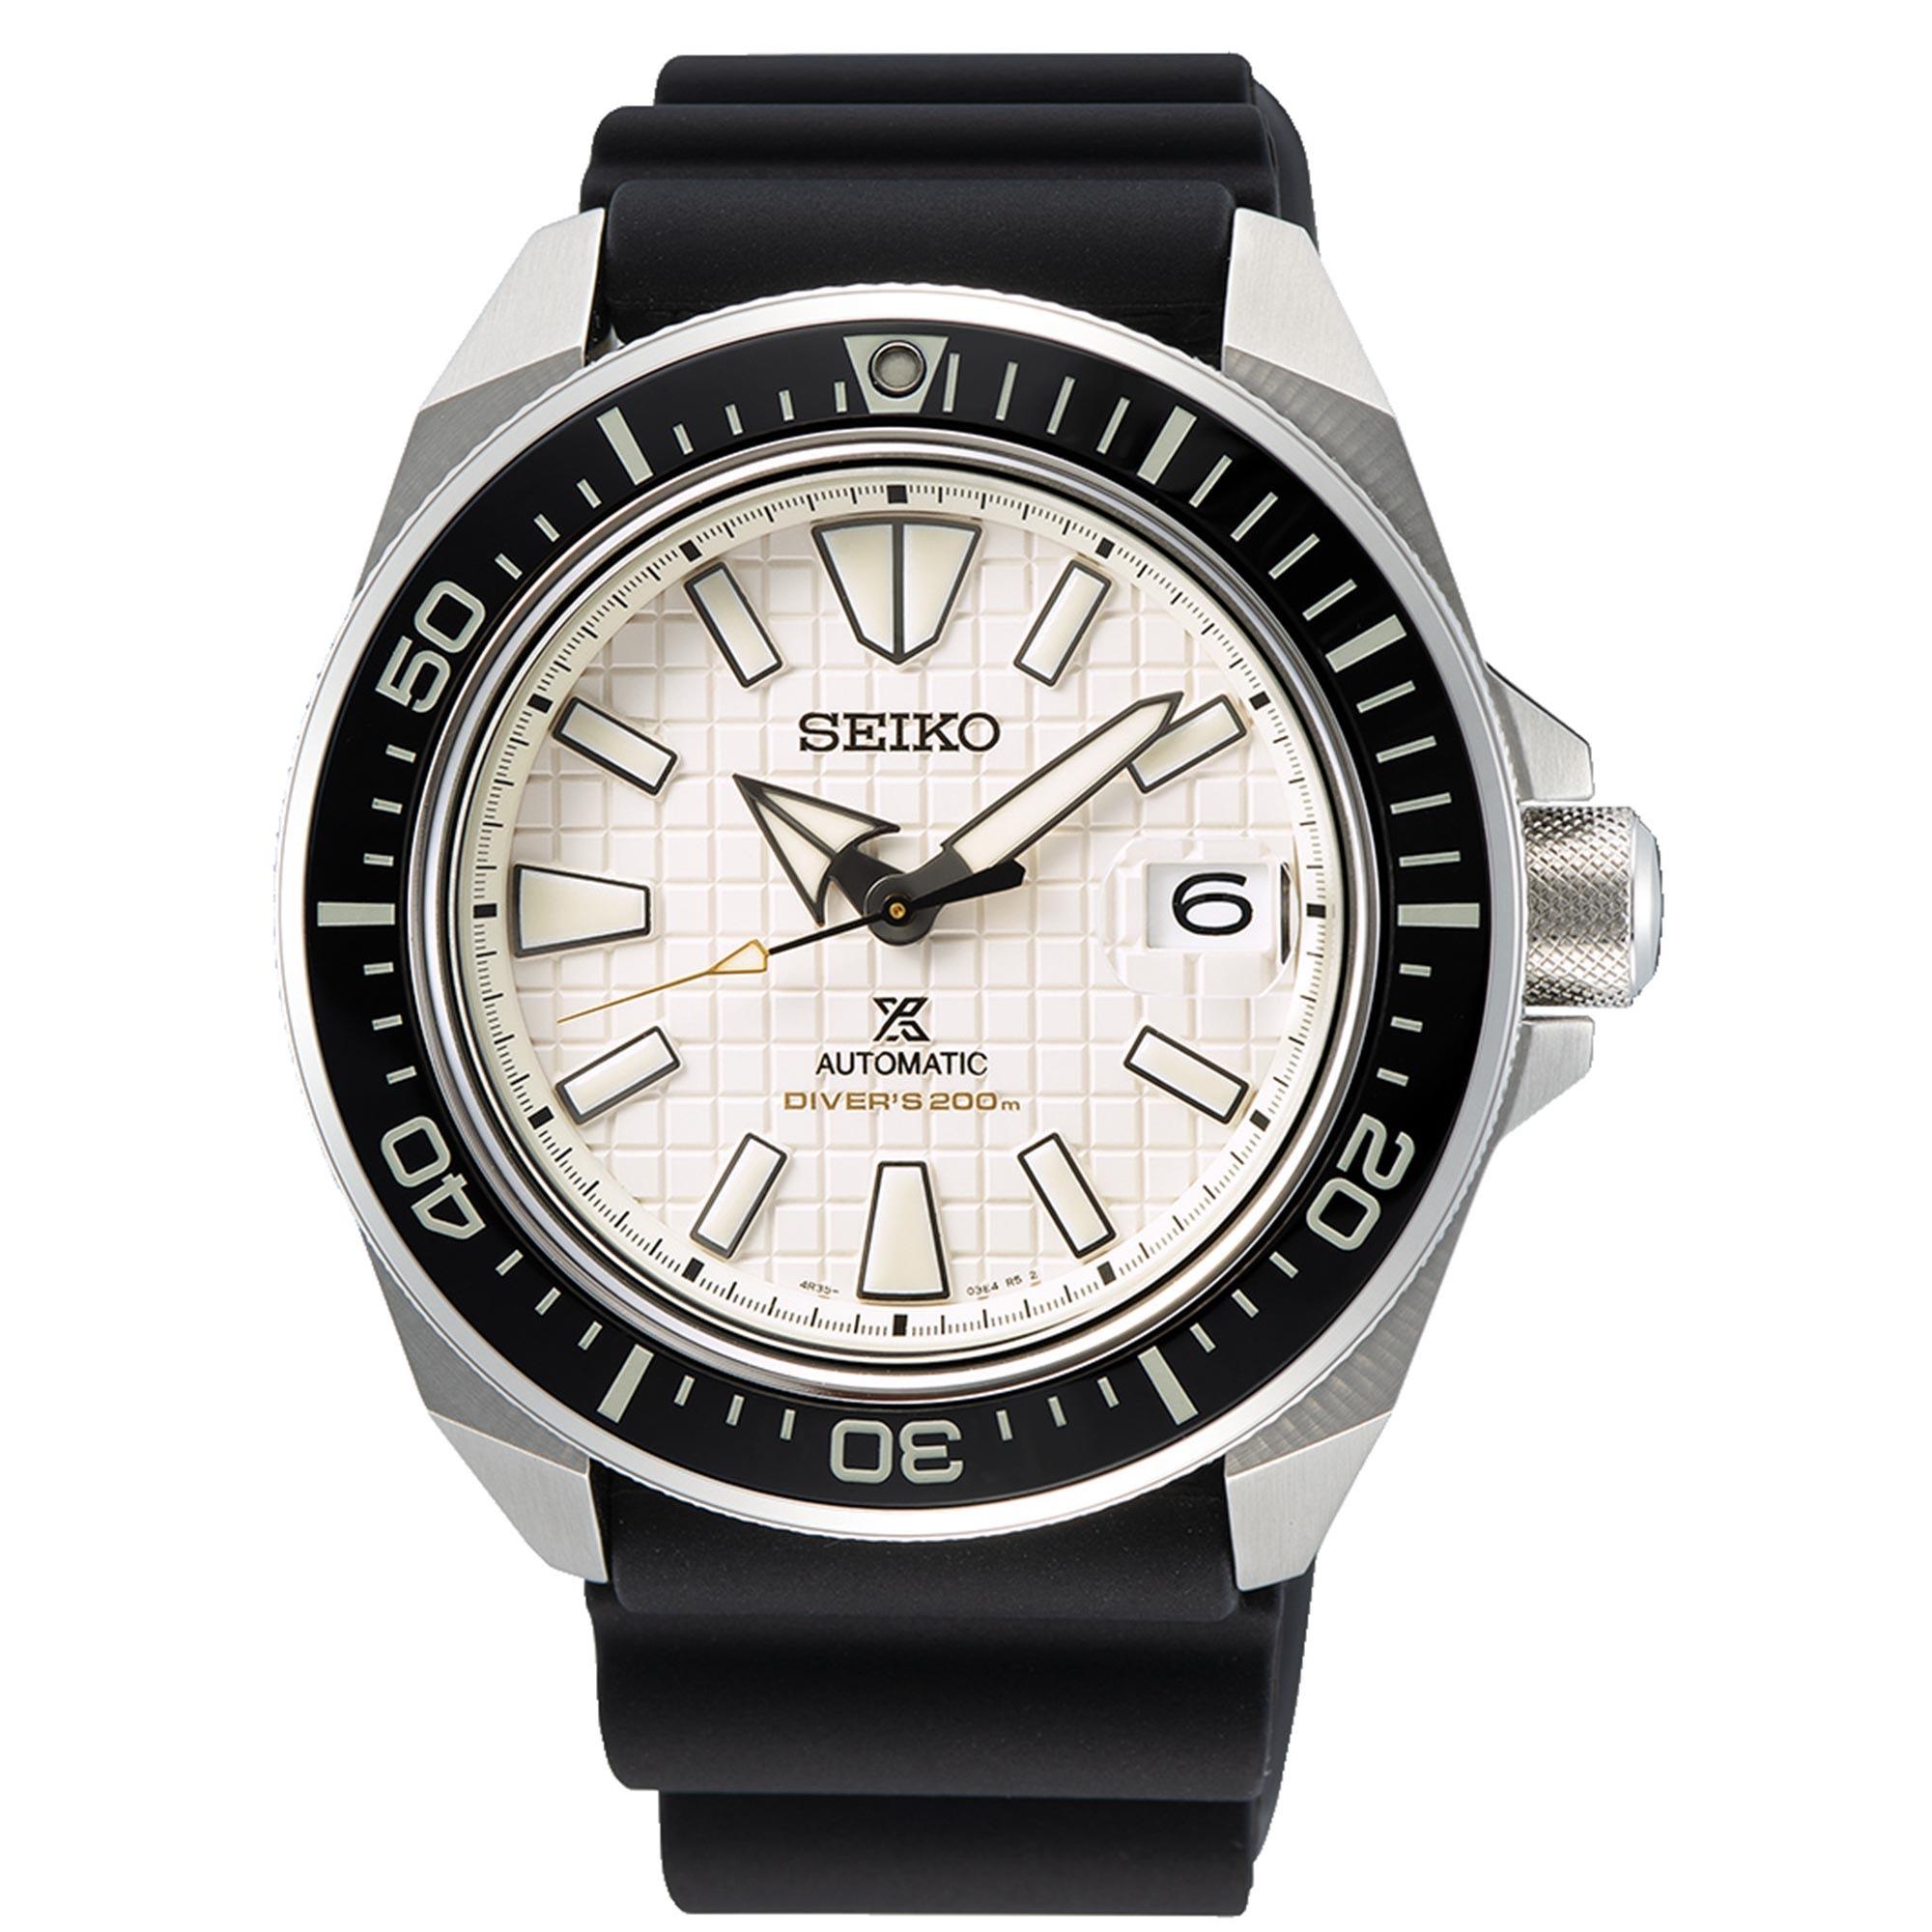 SEIKO PROSPEX KING SAMURAI Automatic White Dial Sapphire Ceramic Mens Watch SRPE37K1 £424 at WatchNation